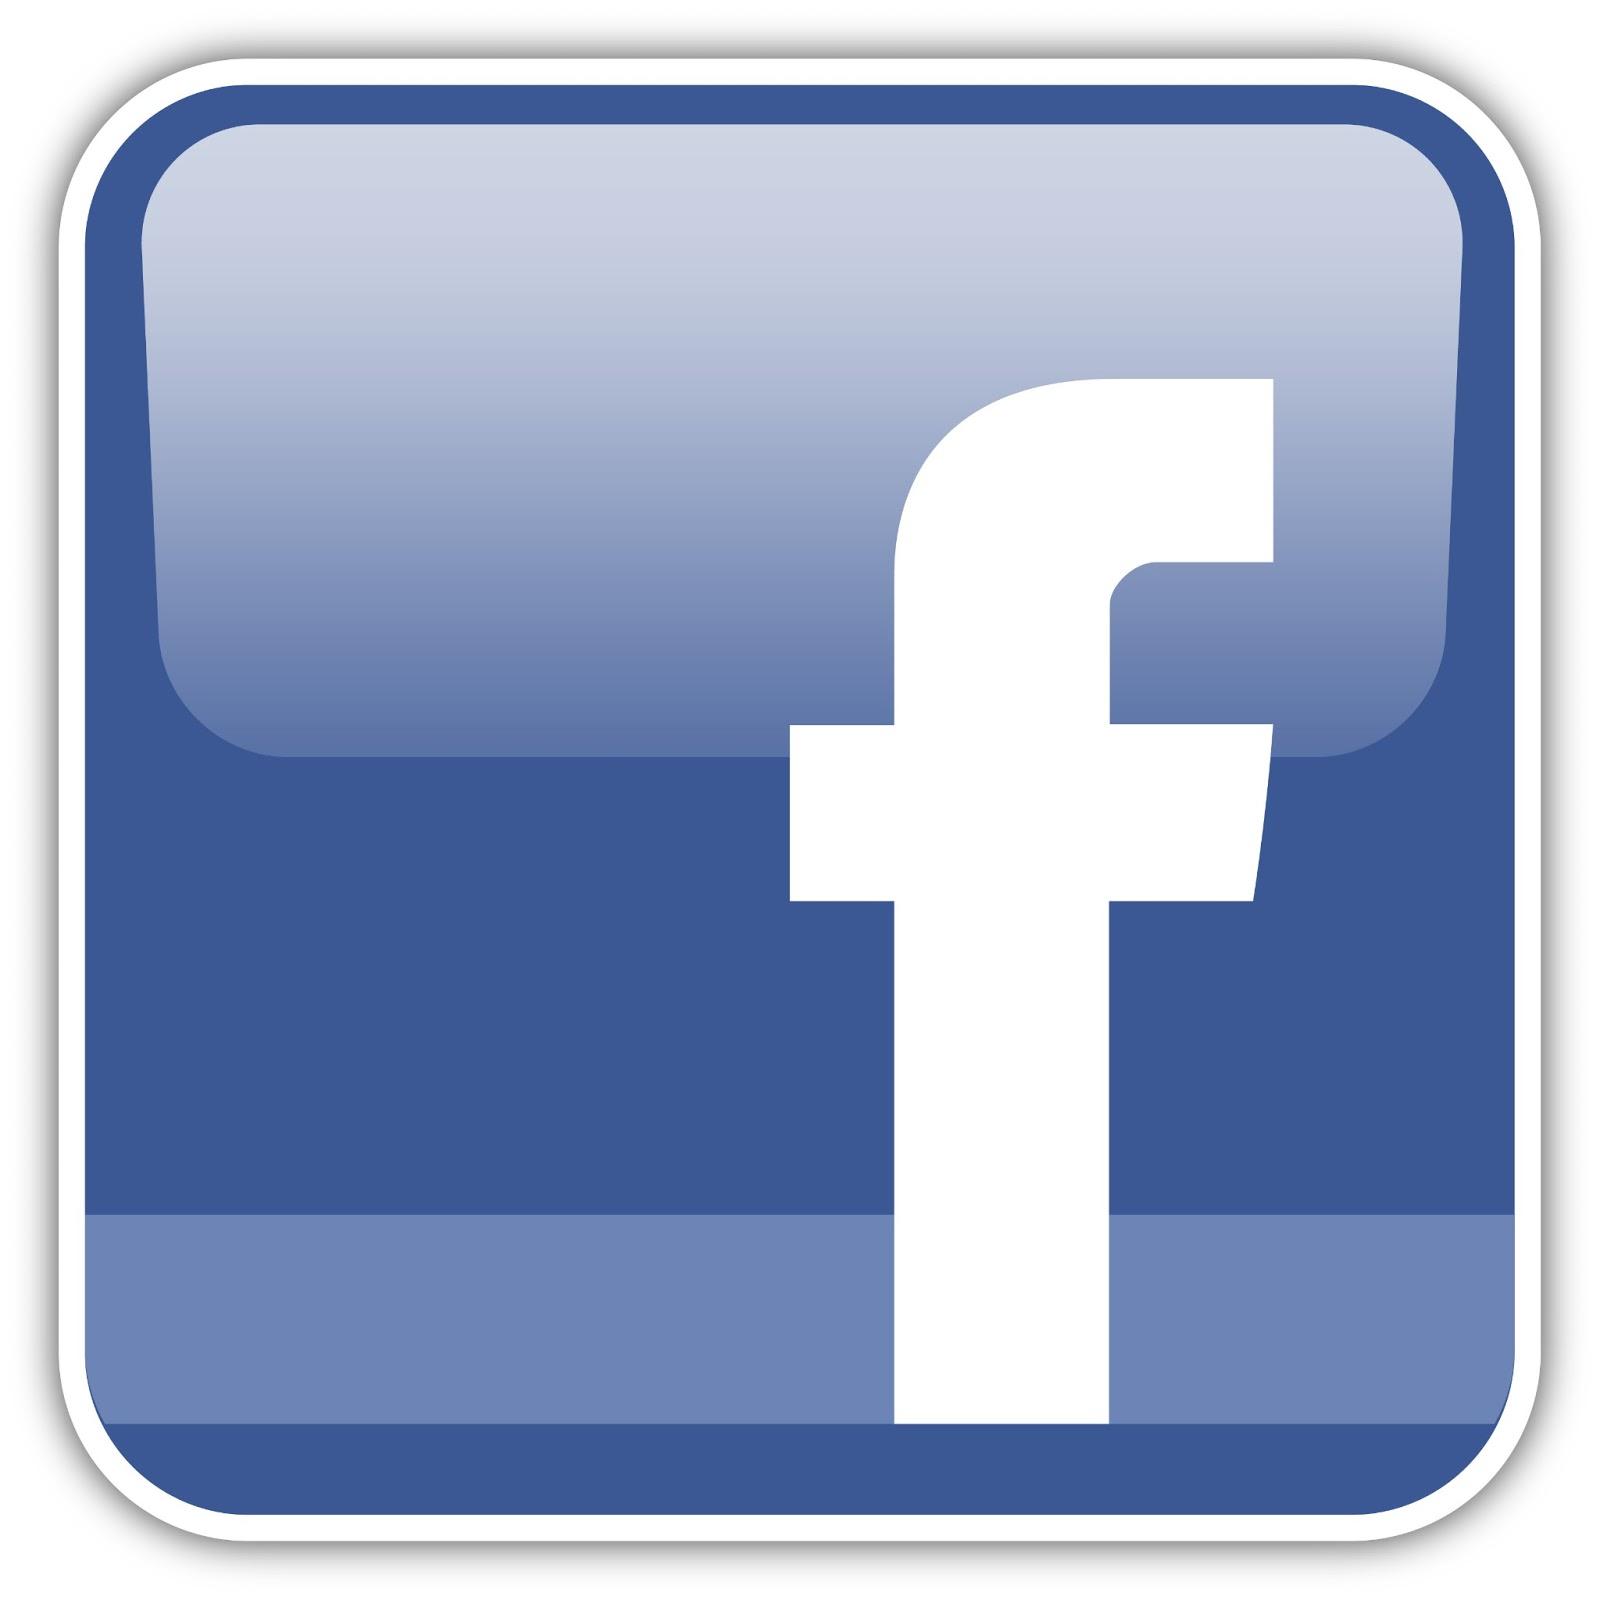 Facebook Sportjuf Janne